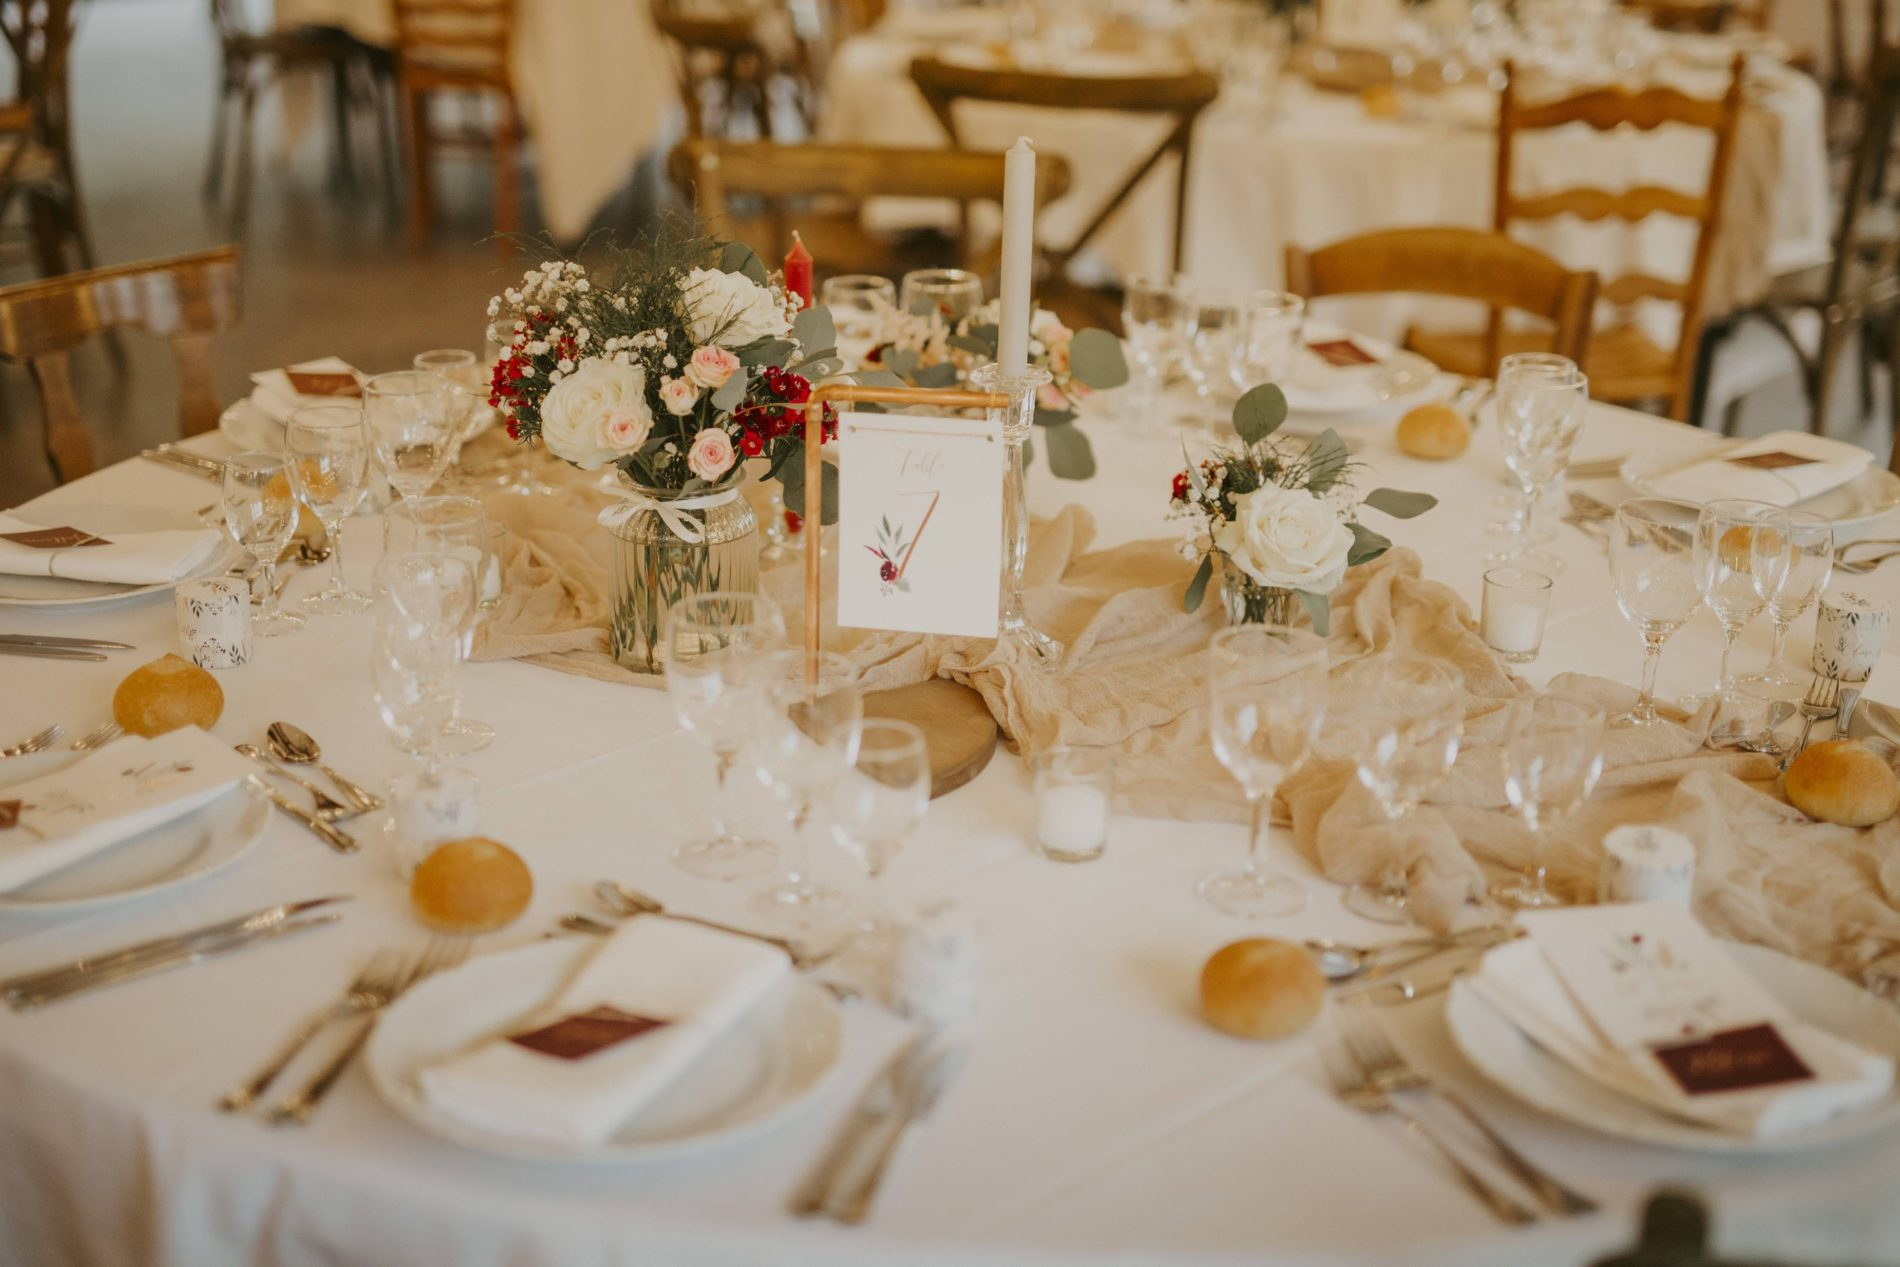 0152_04-CelineSereivuth-154-obonheurdesdames-decoration-mariage-location-Jordane-Chaillou